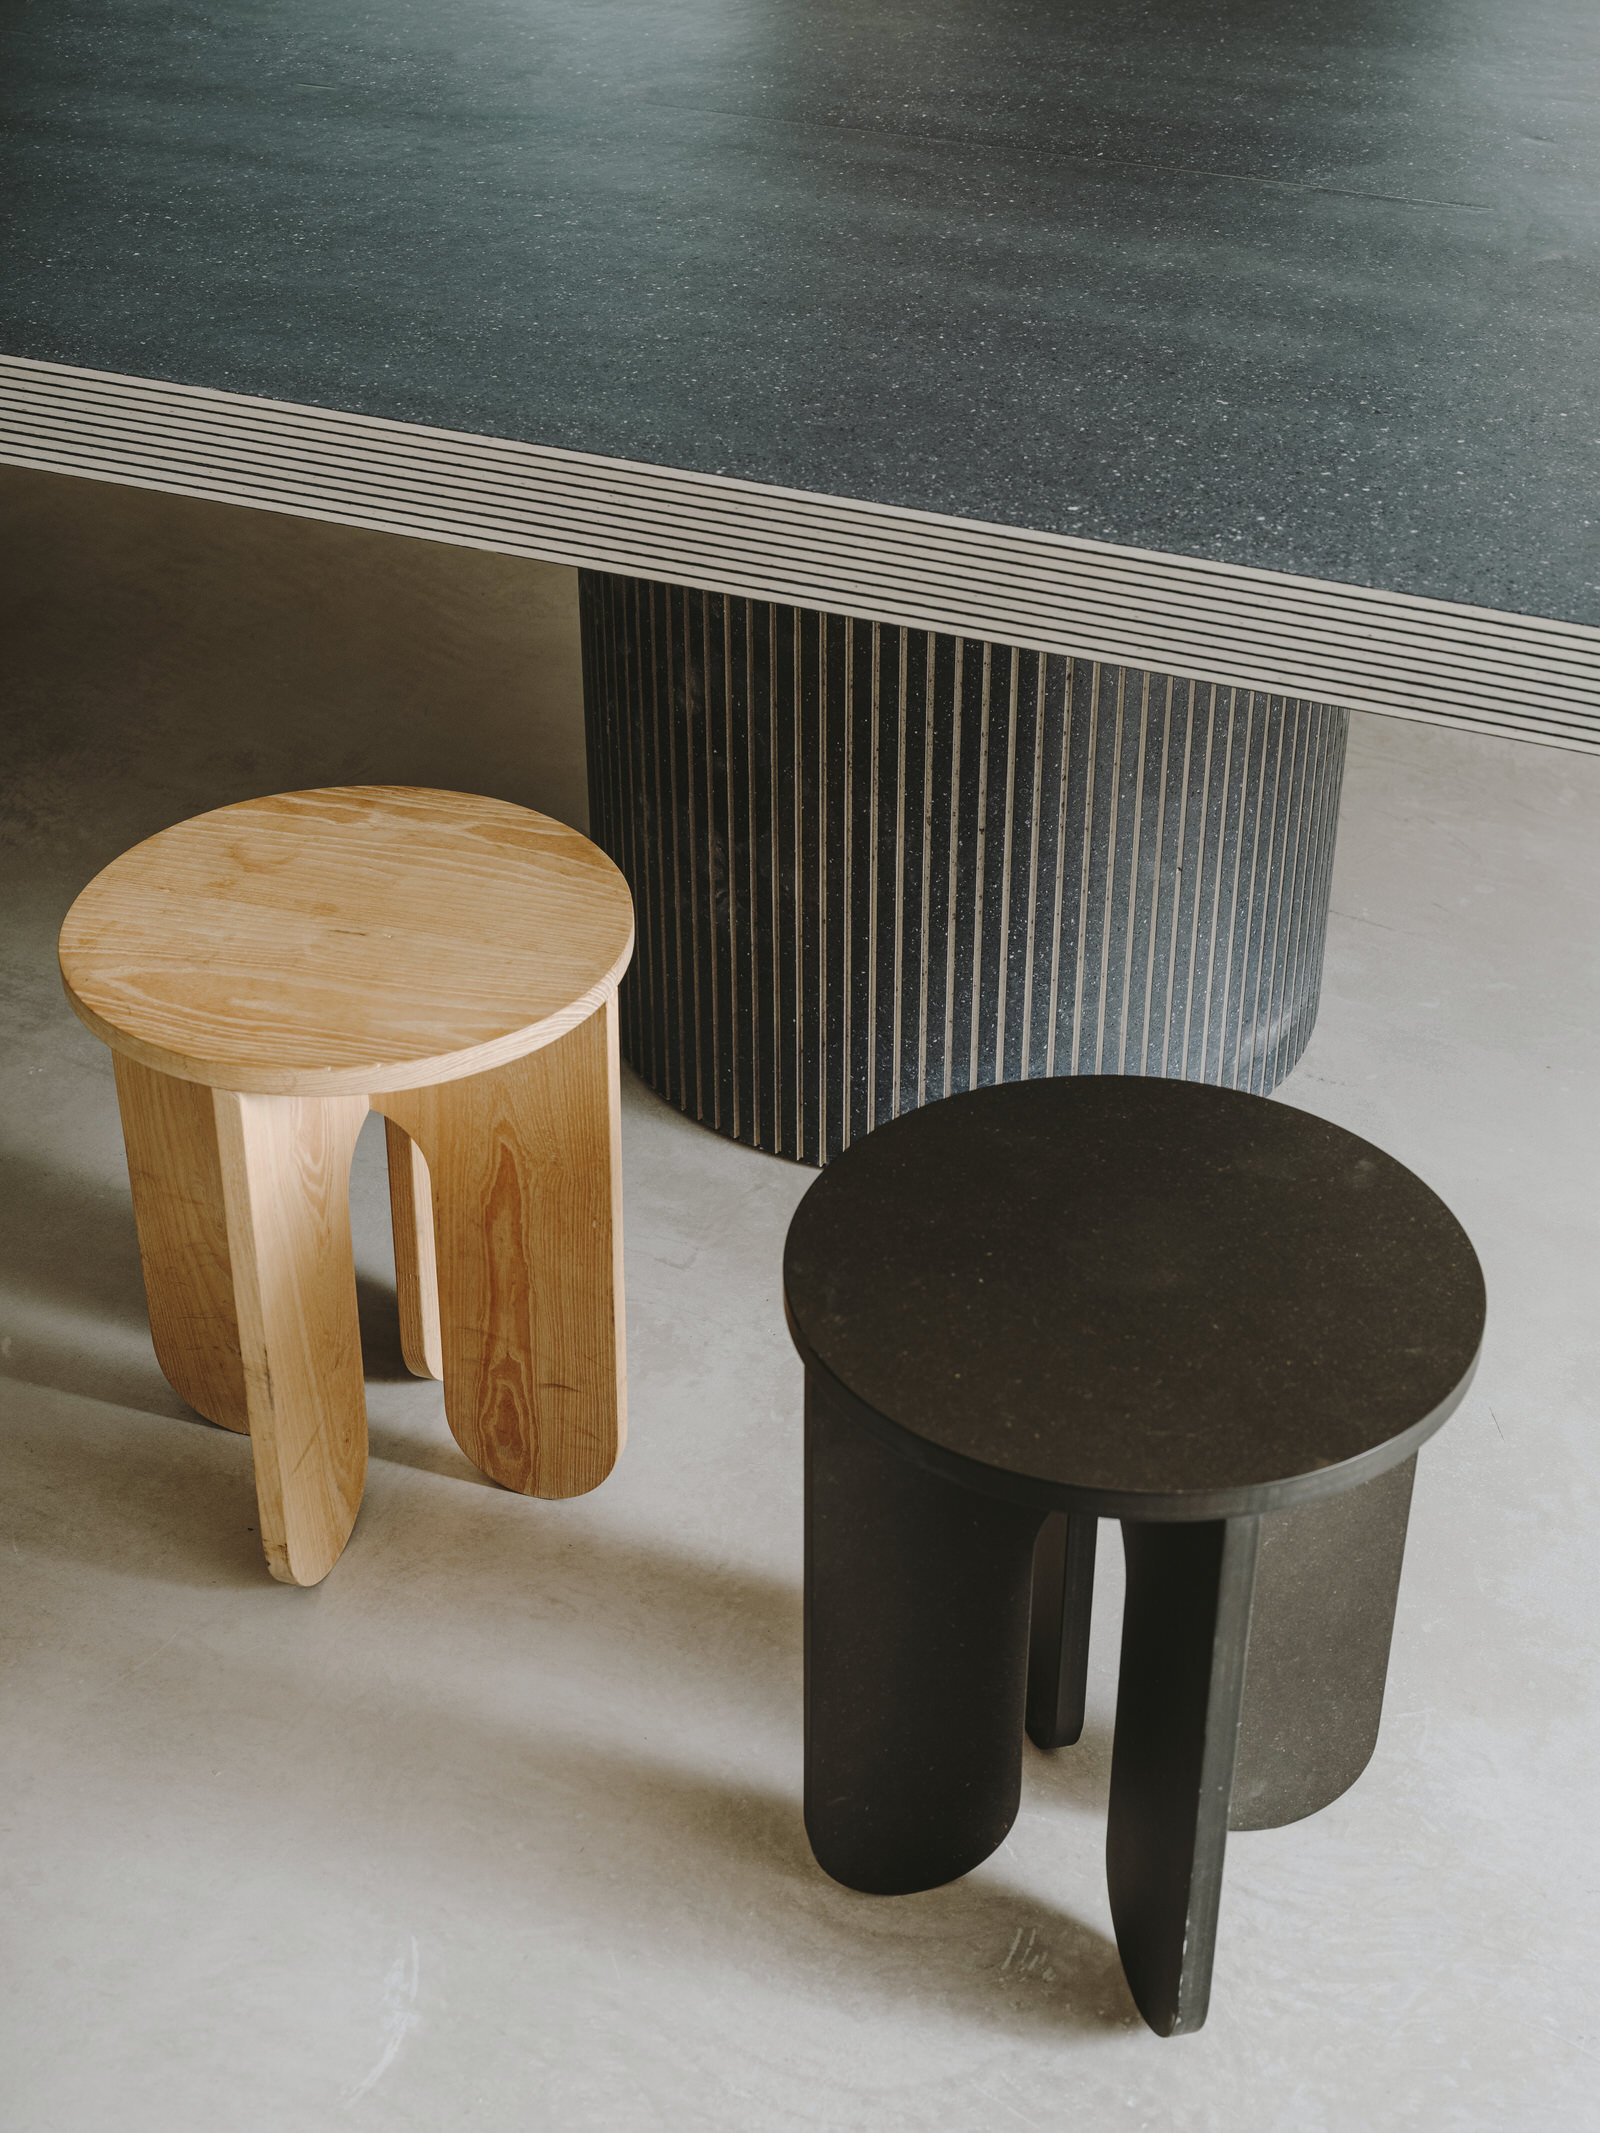 Mesura Architecture Design Cloudworks Penthouse Office Barcelona Photo Salva Lopez Yellowtrace 11